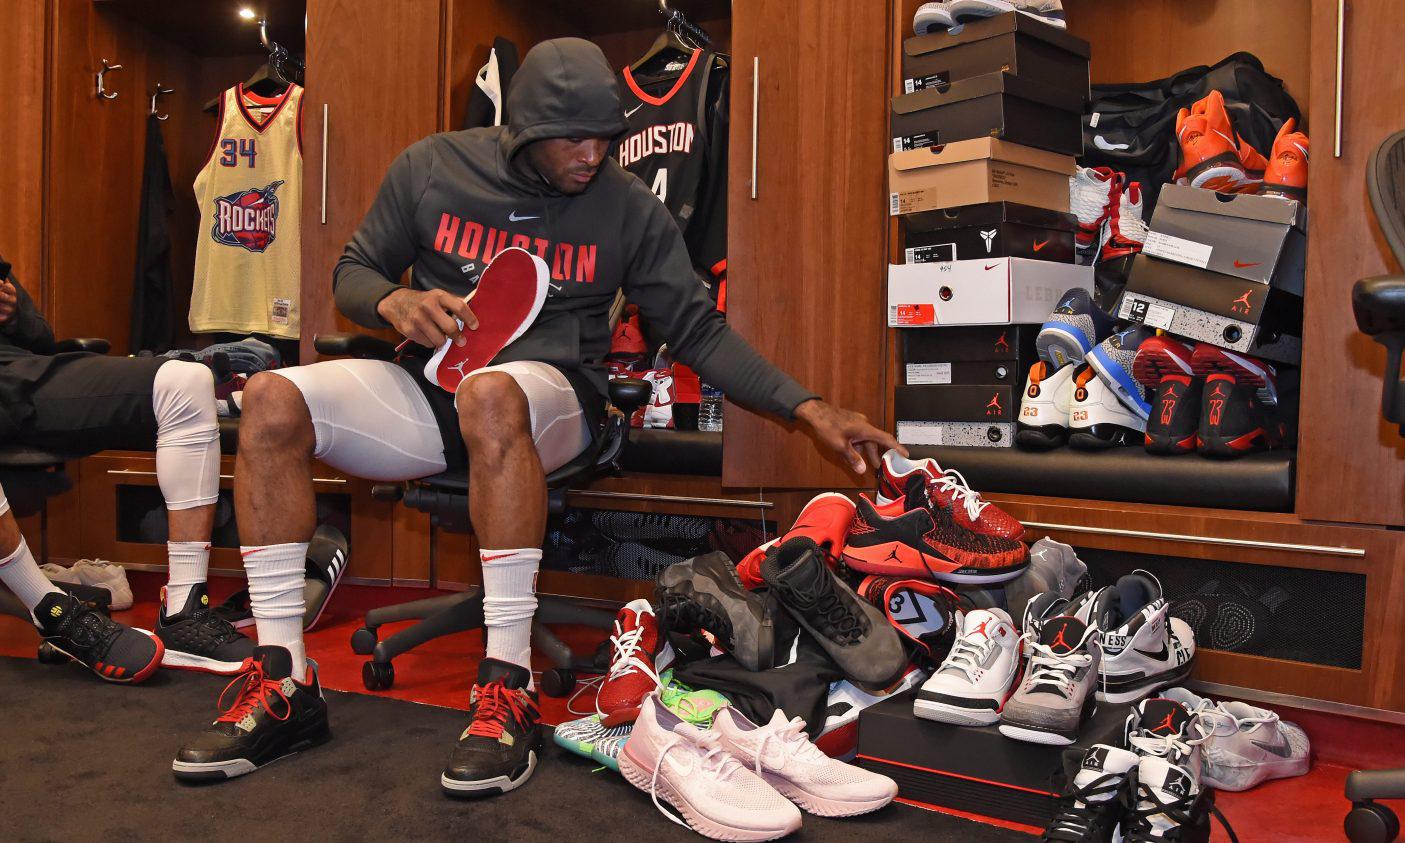 NBA 赛季过半,PJ Tucker 已上身 10 万美金以上市值的球鞋